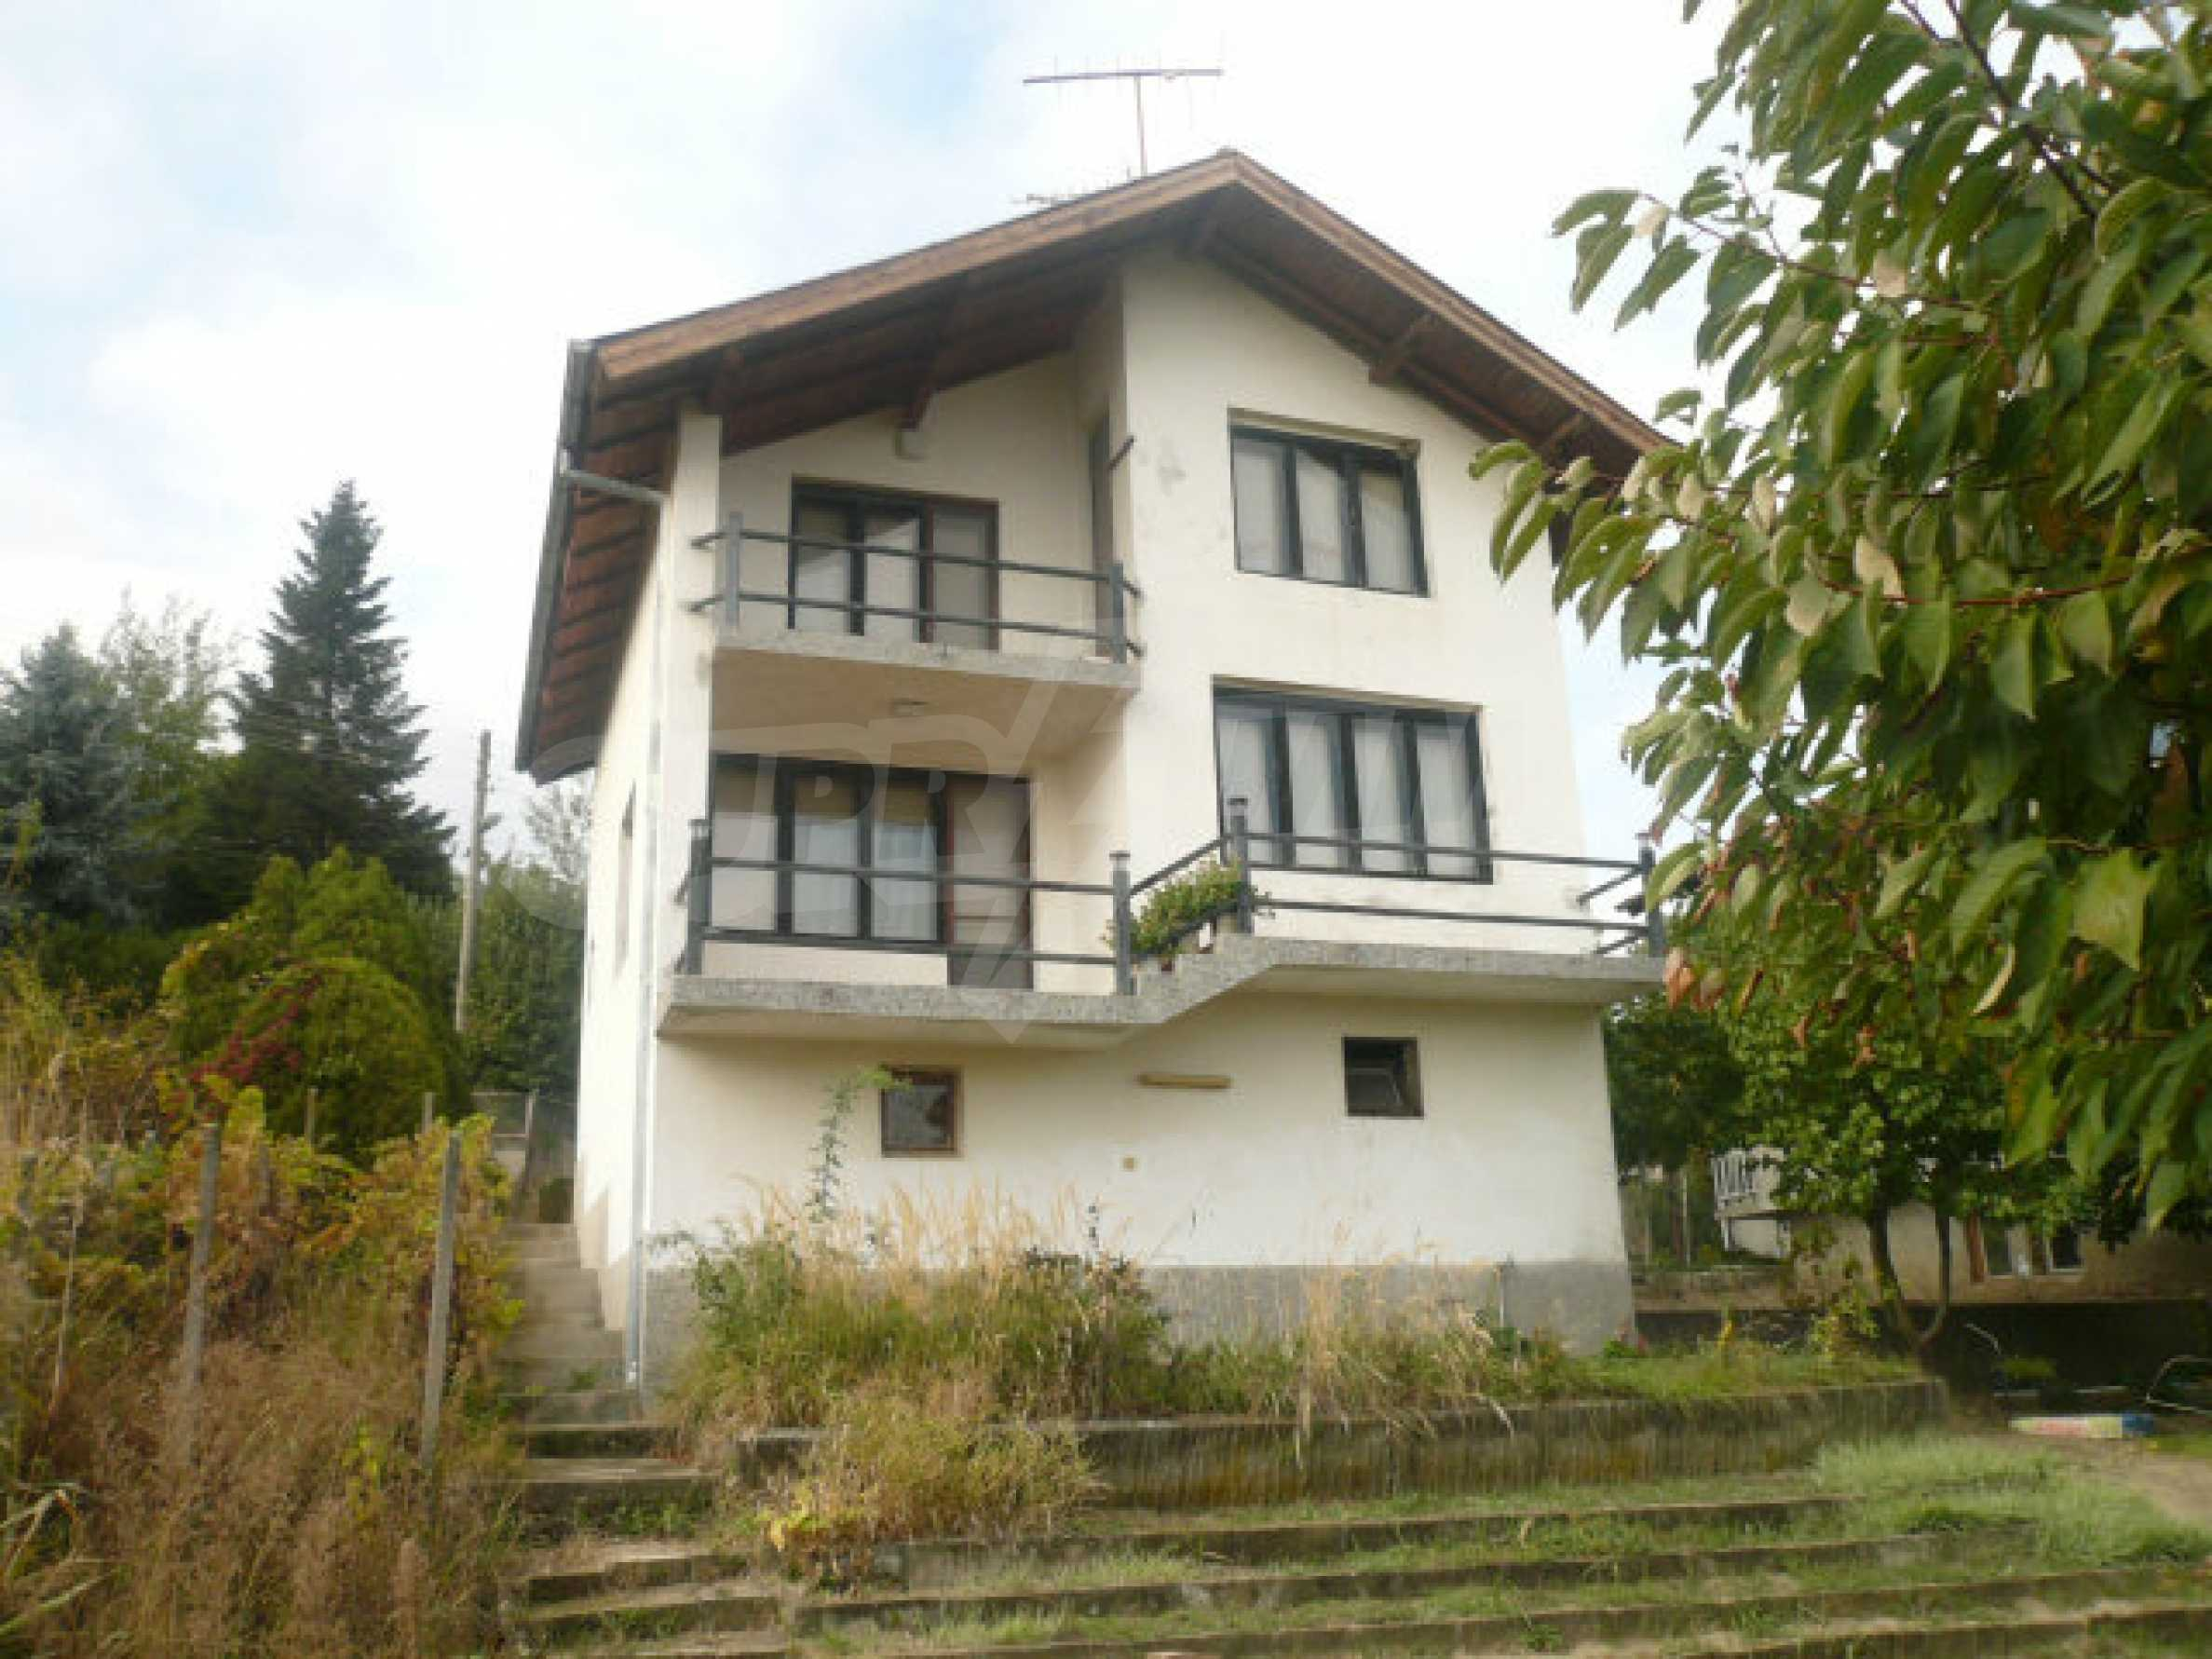 Three-storey villa next to Danube river